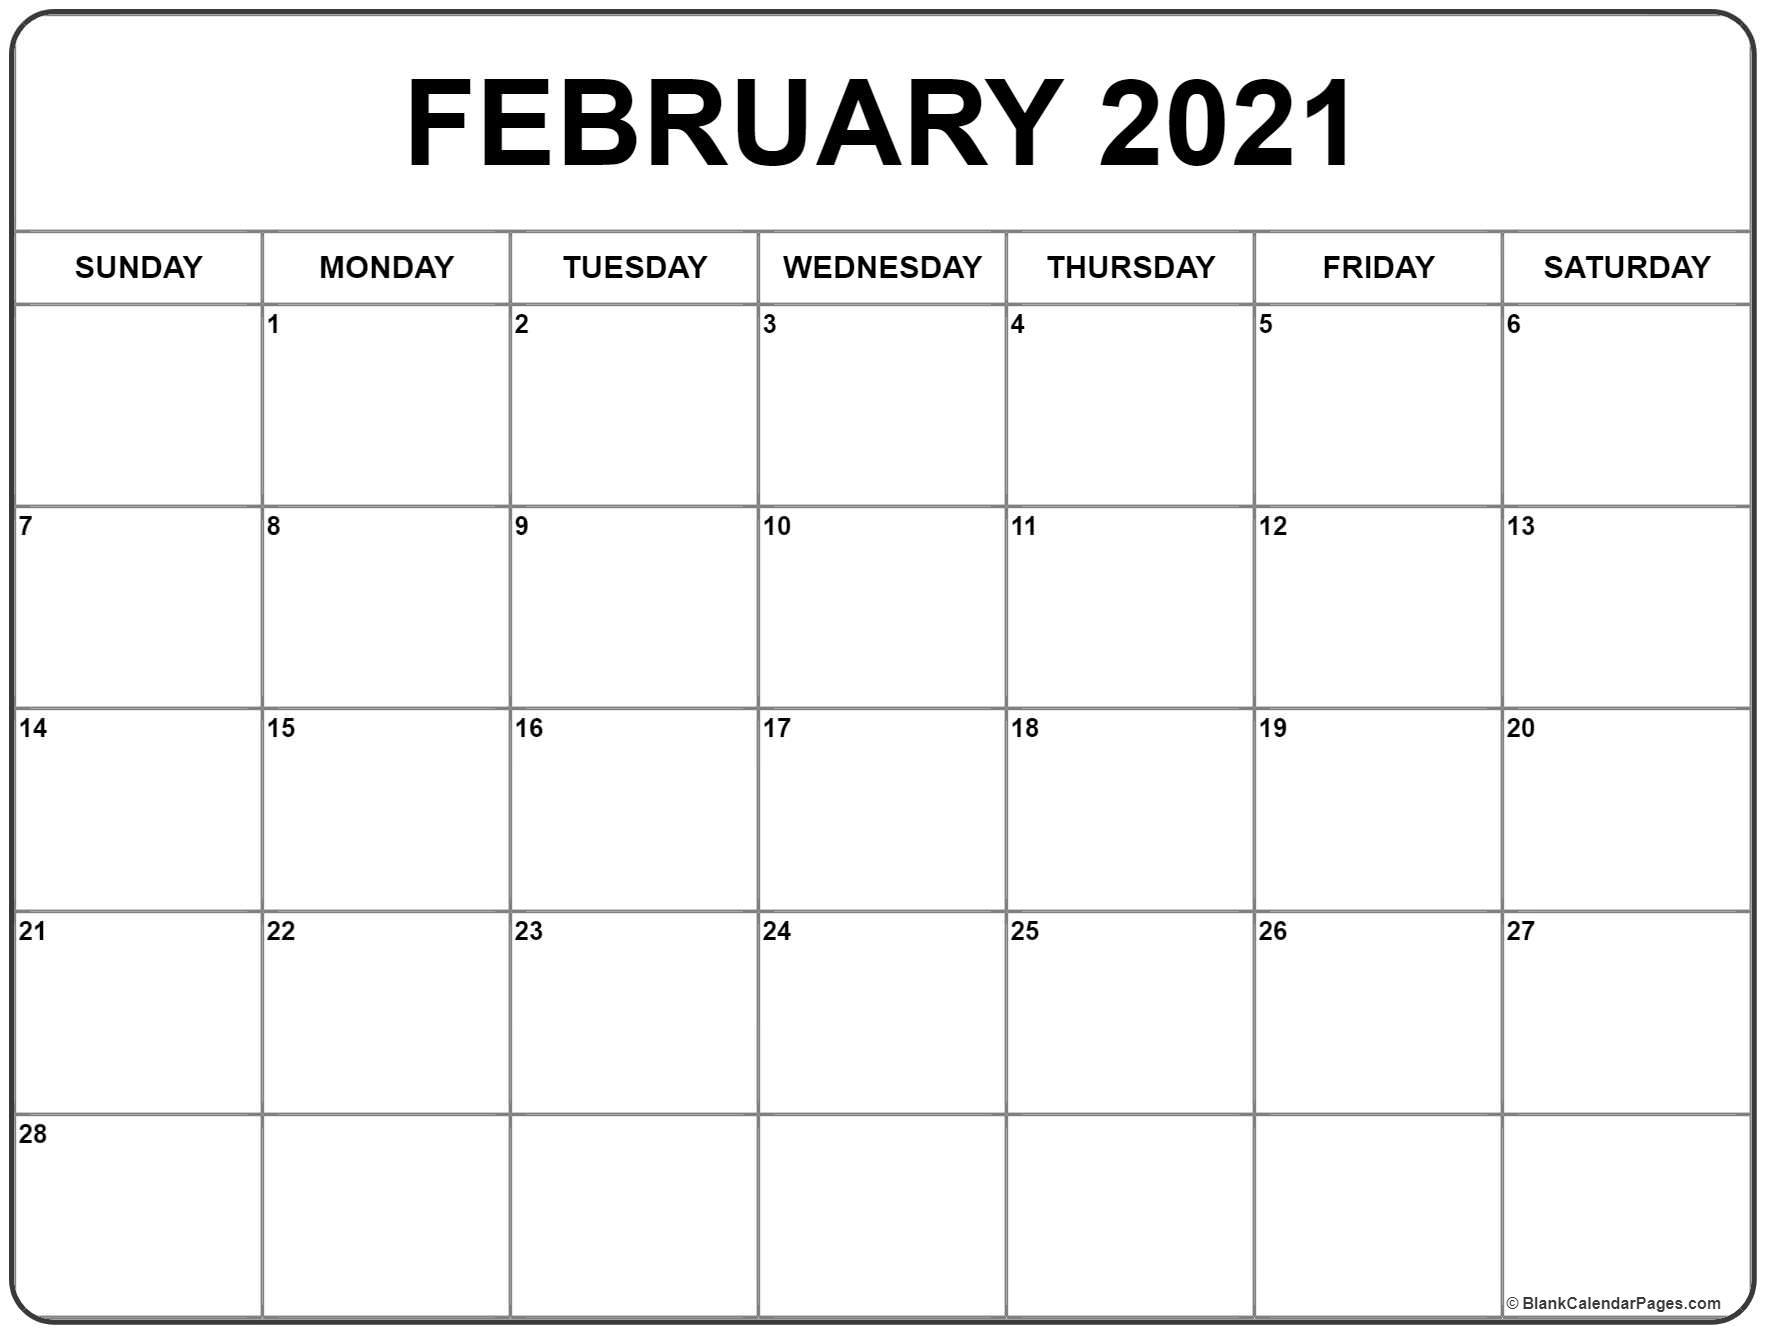 2021 February Calendar Printable Avnitasoni